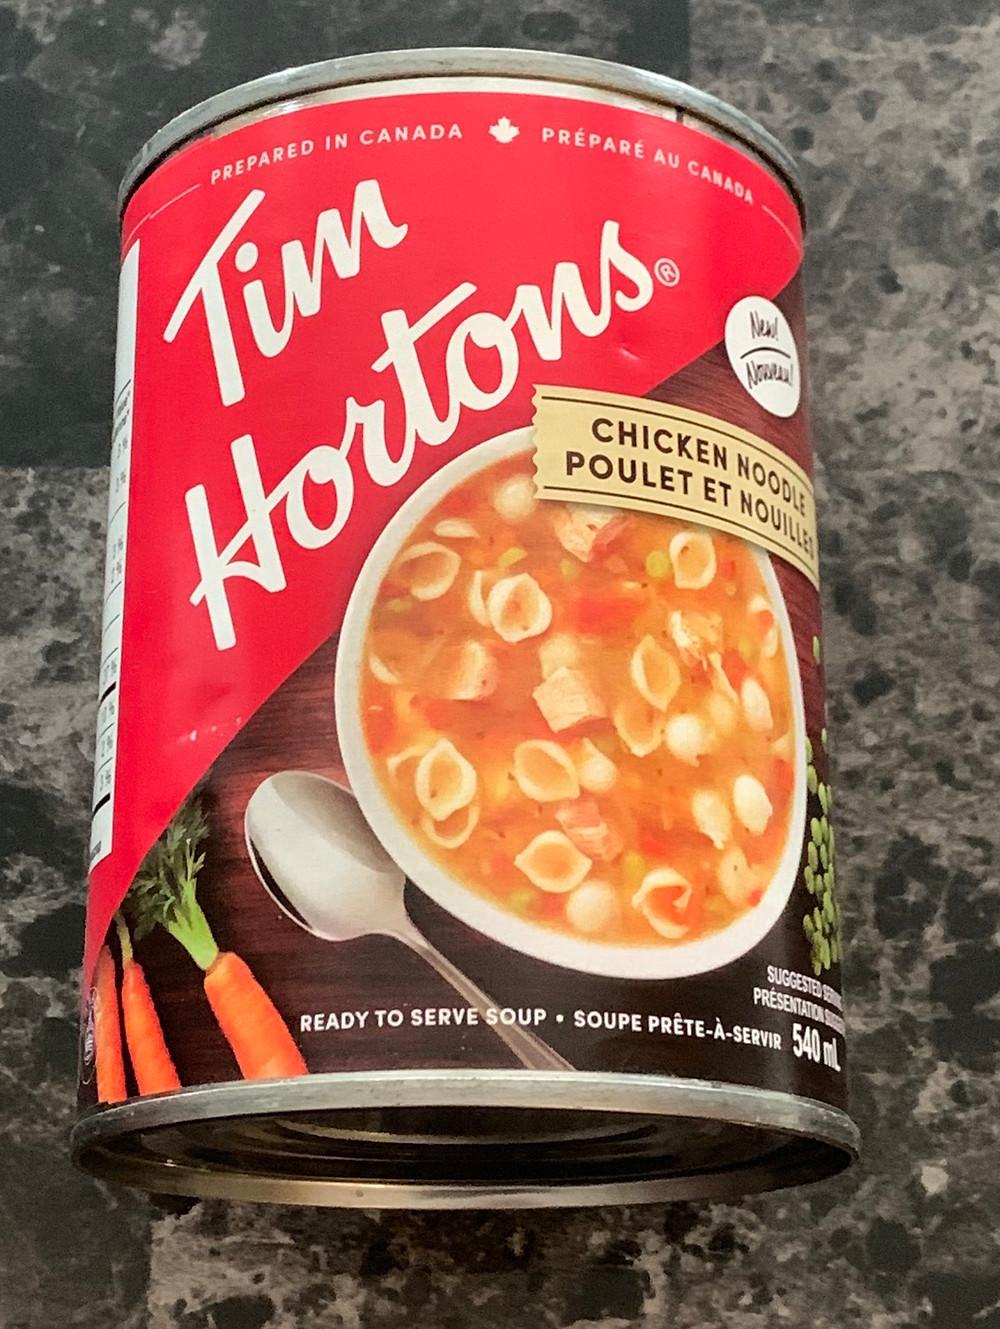 Costco Tim Hortons Chicken Noodle Soup